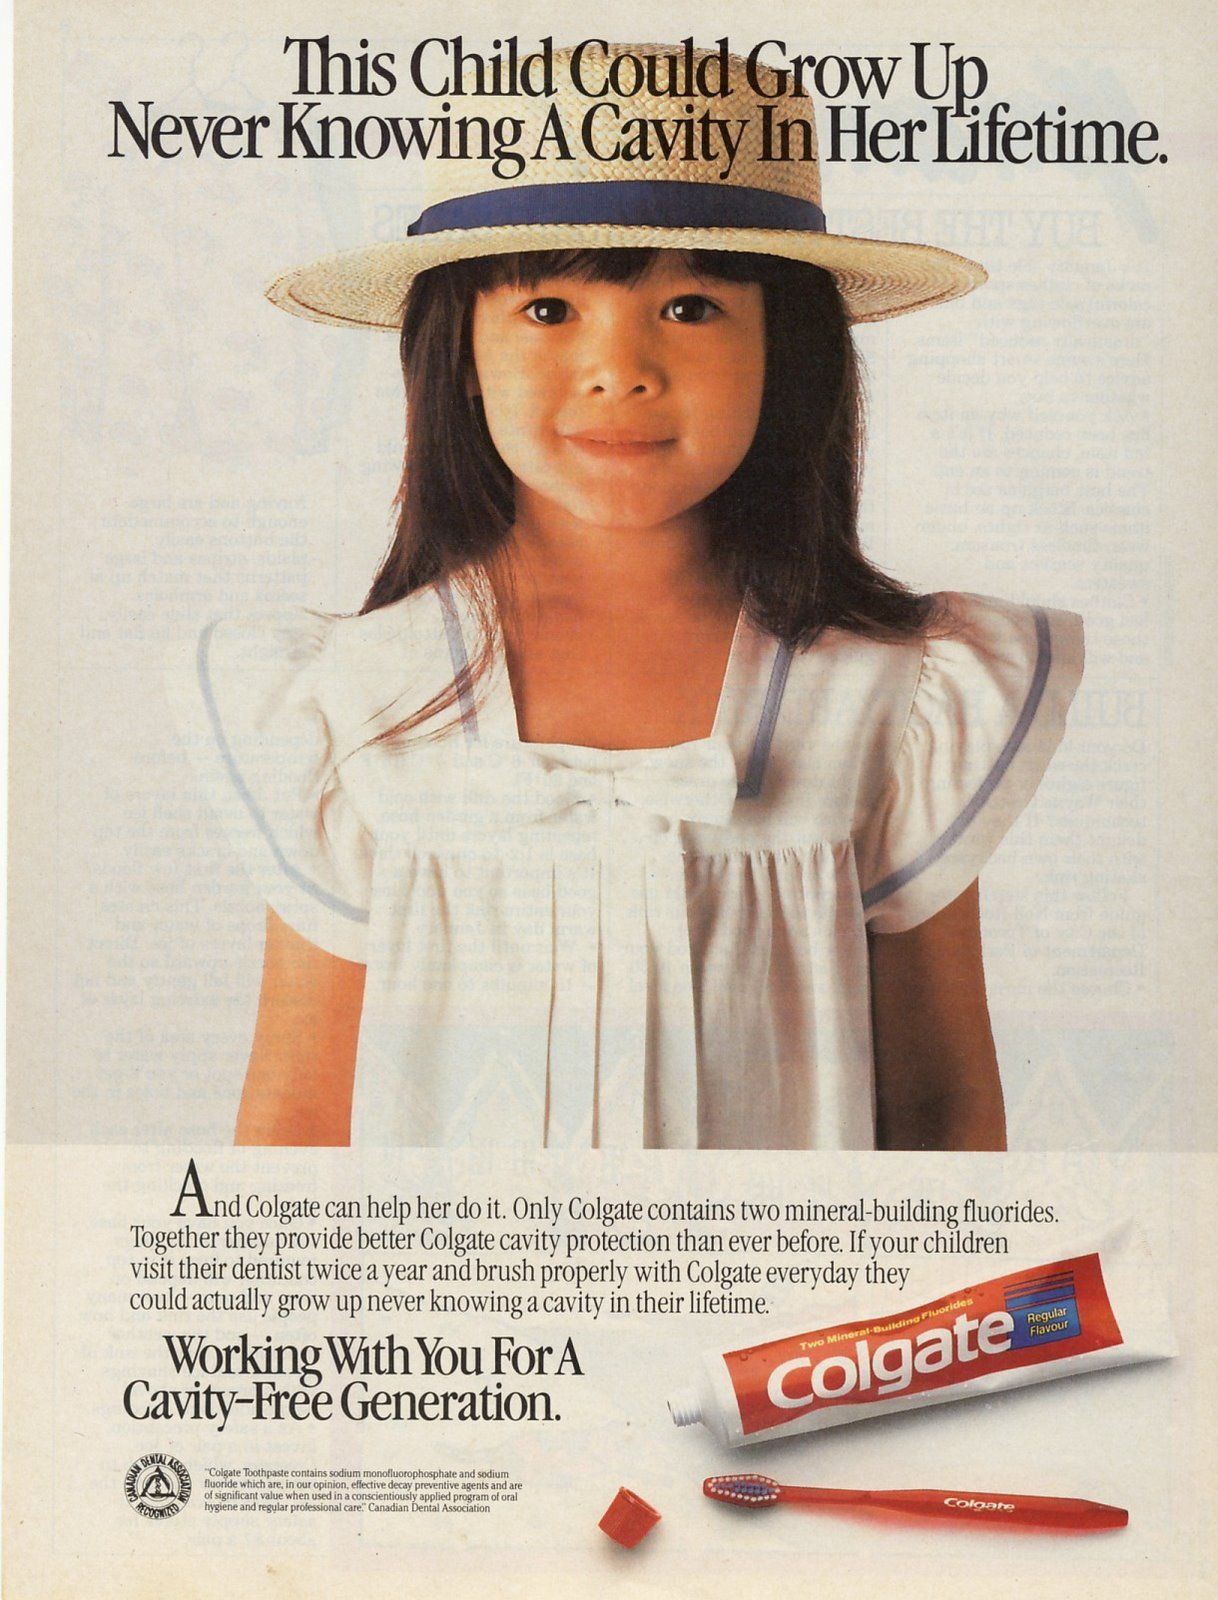 1986 Colgate Toothpaste | Colgate toothpaste, Colgate